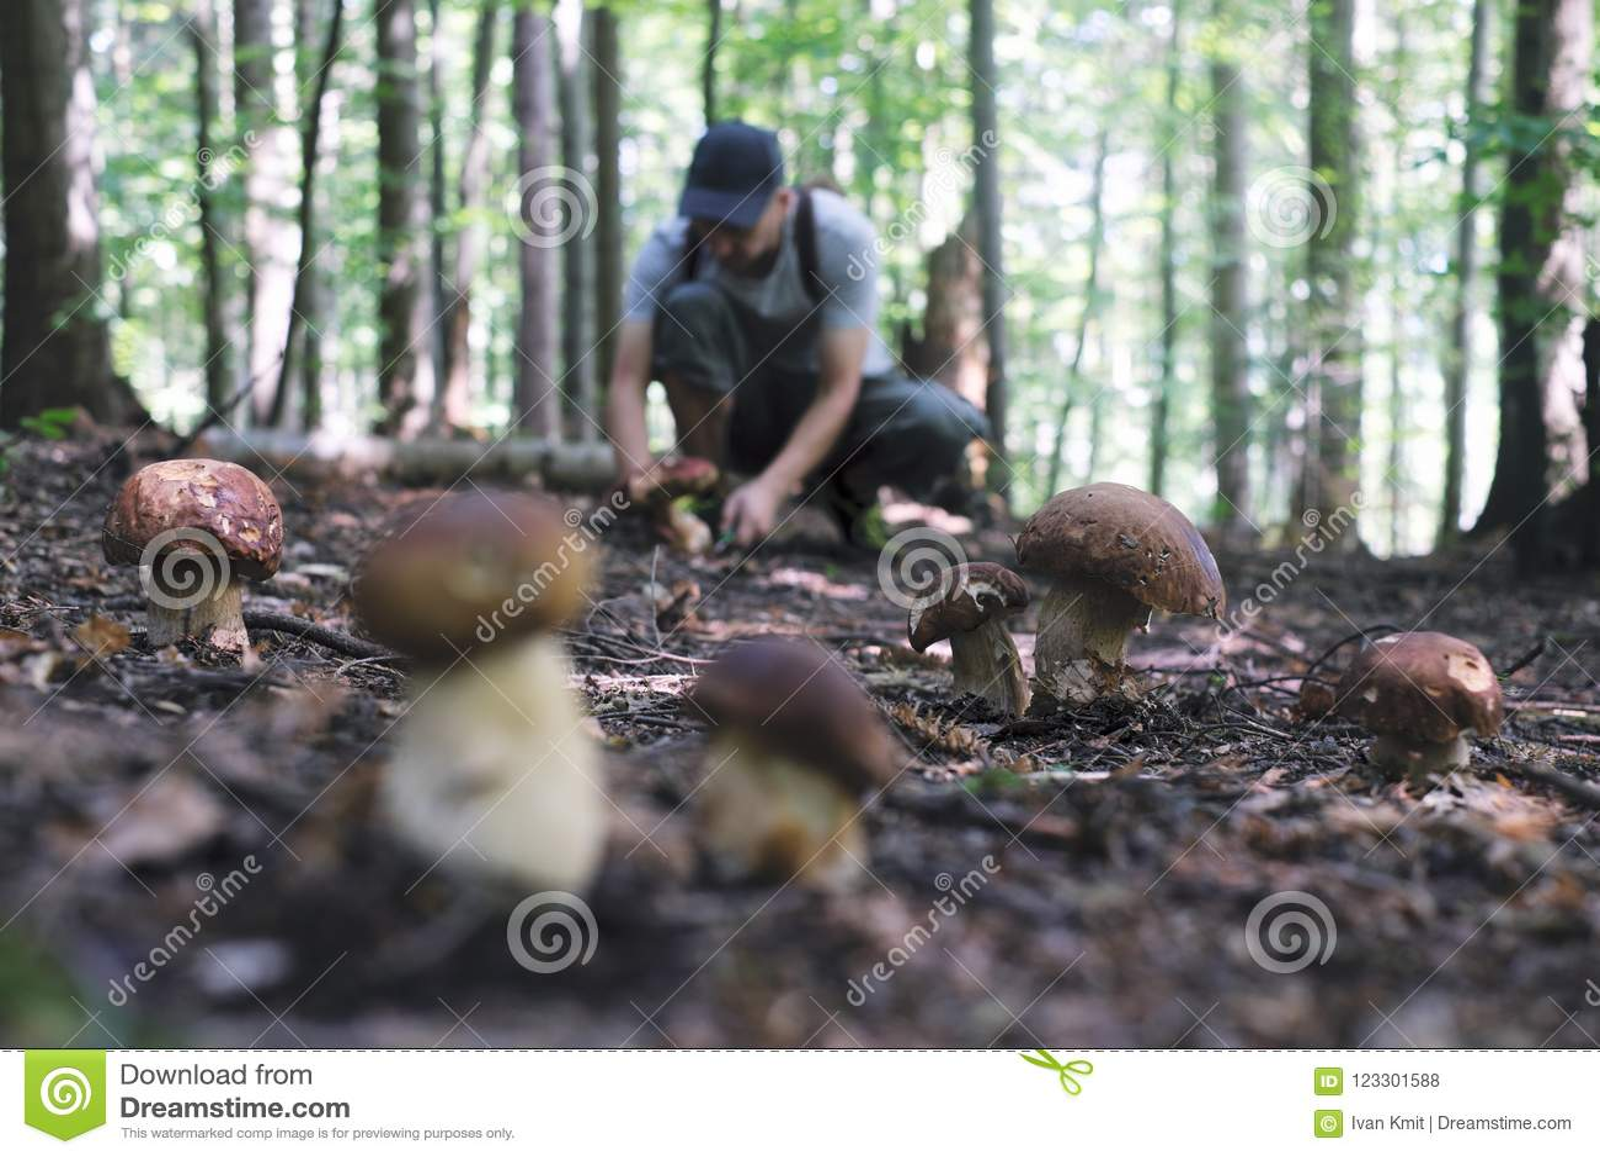 O homem recolhe cogumelos